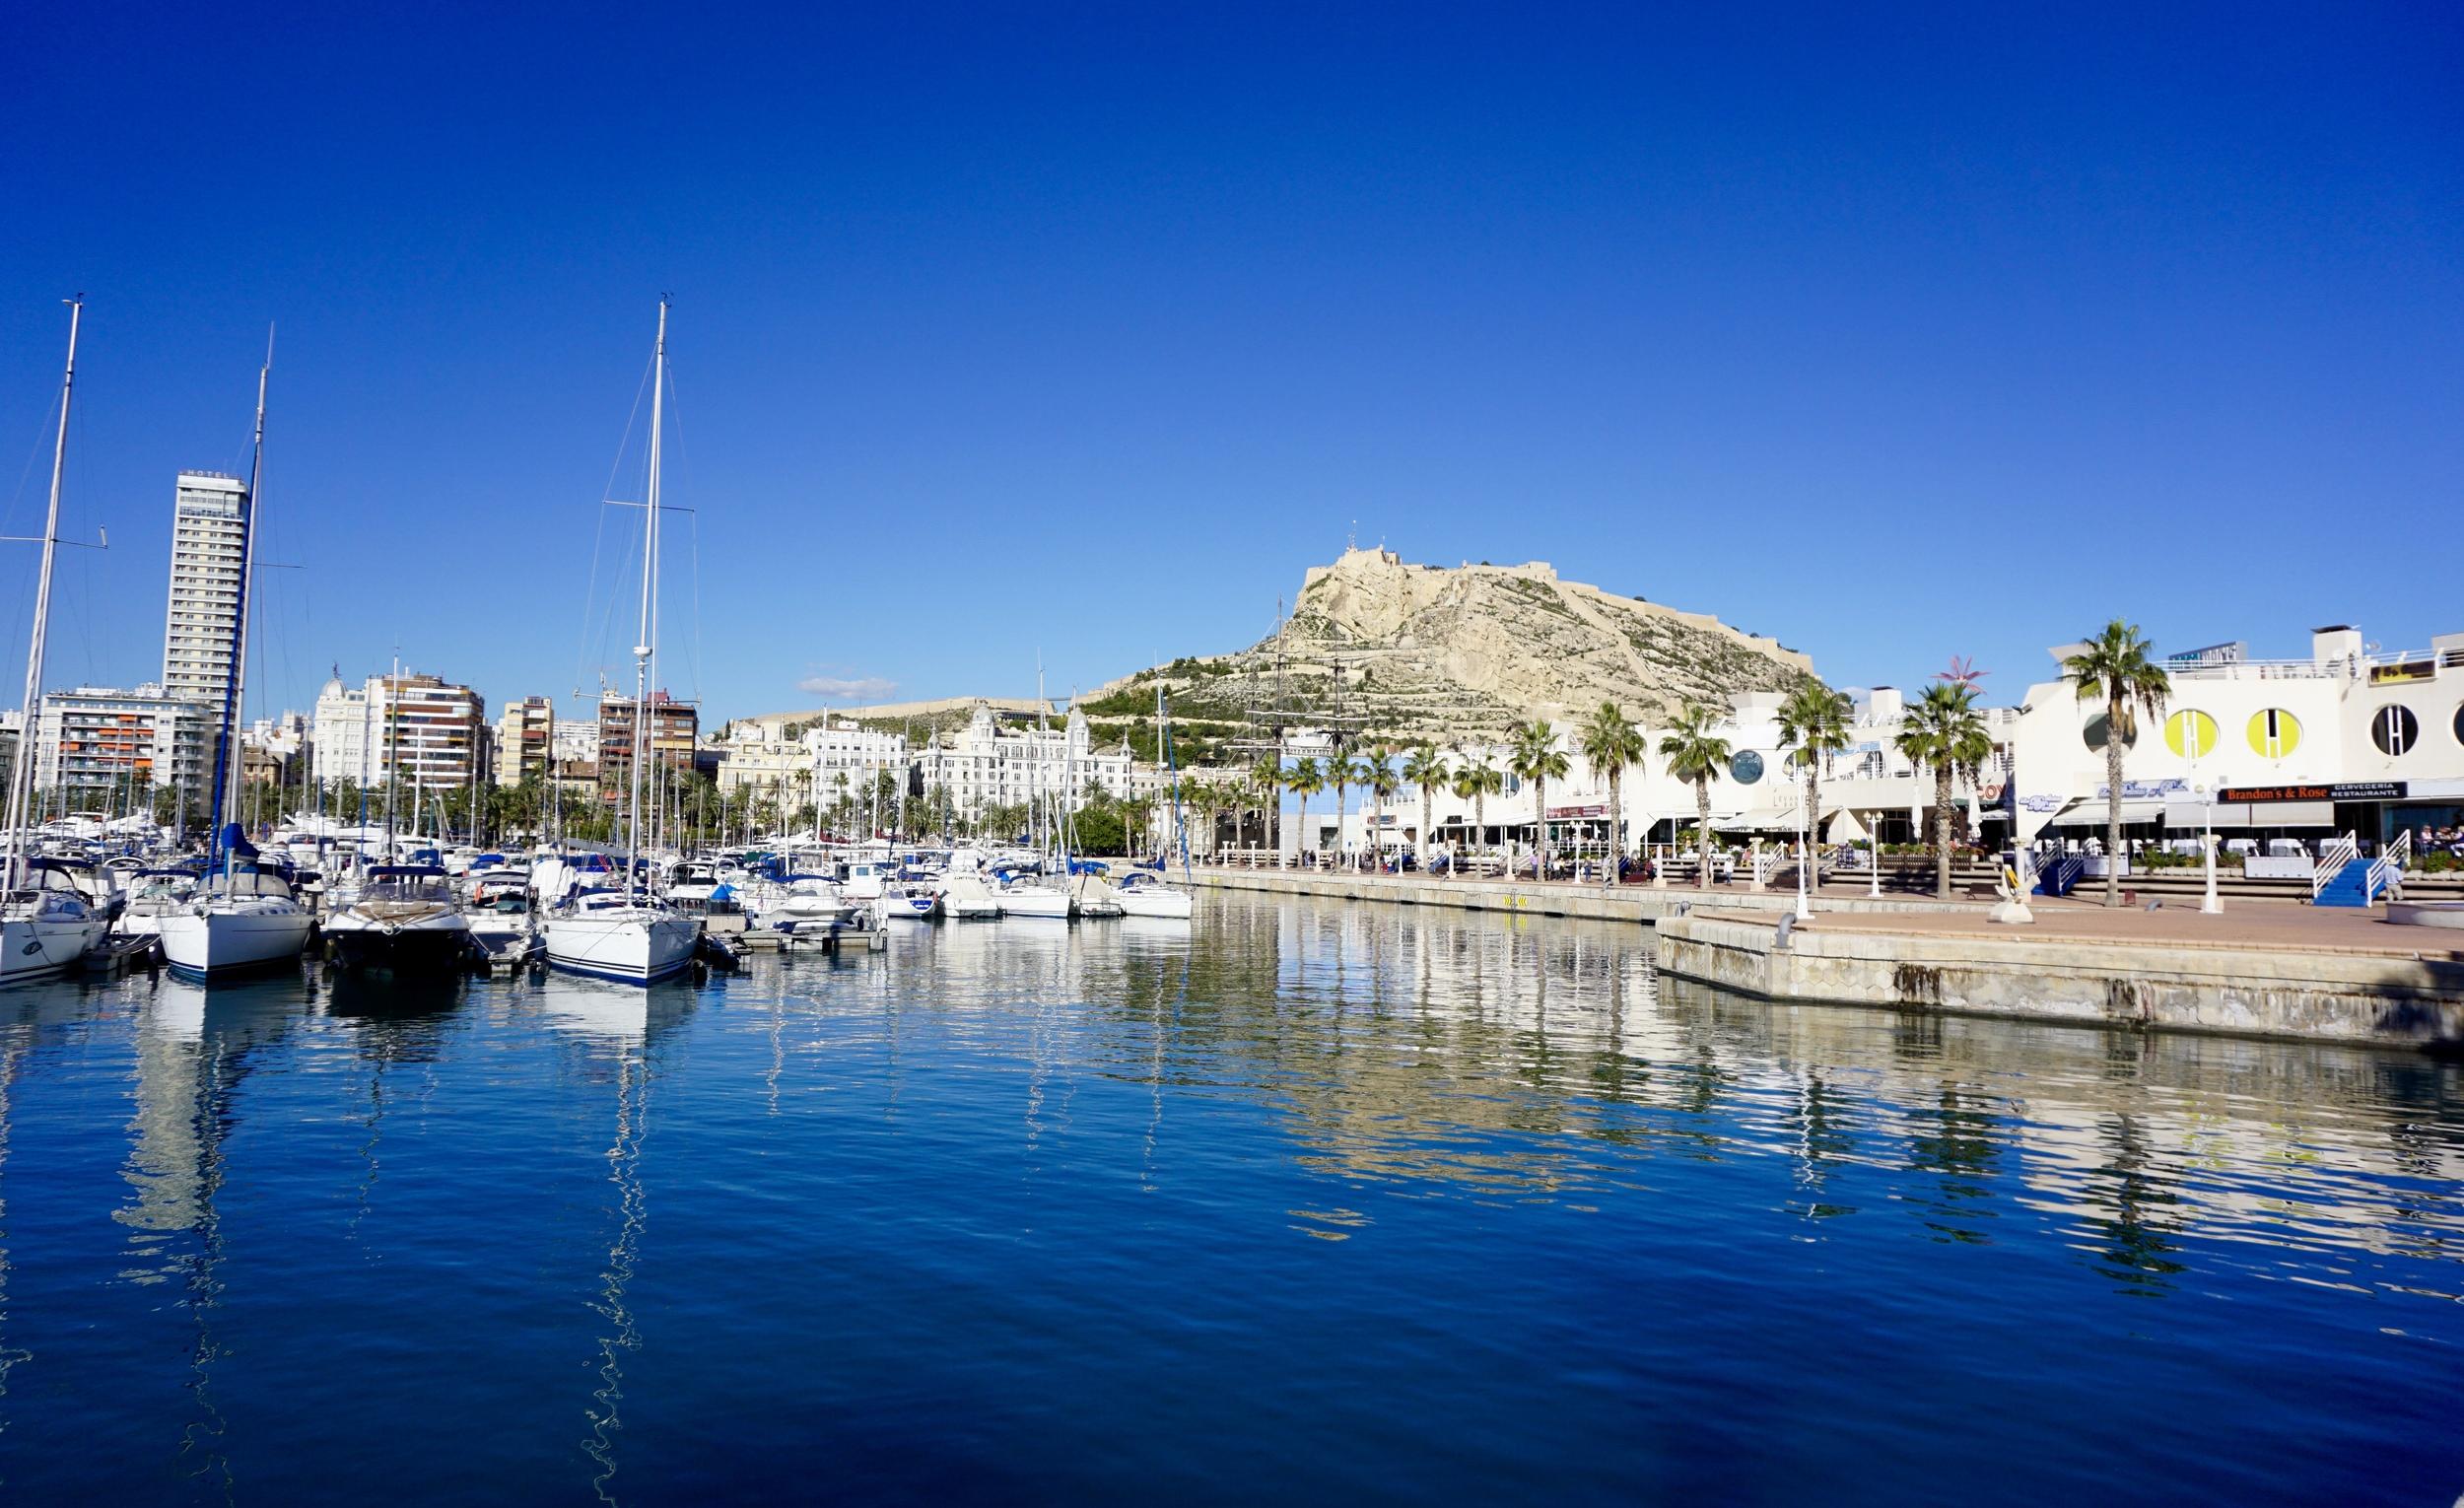 Alicante skyline